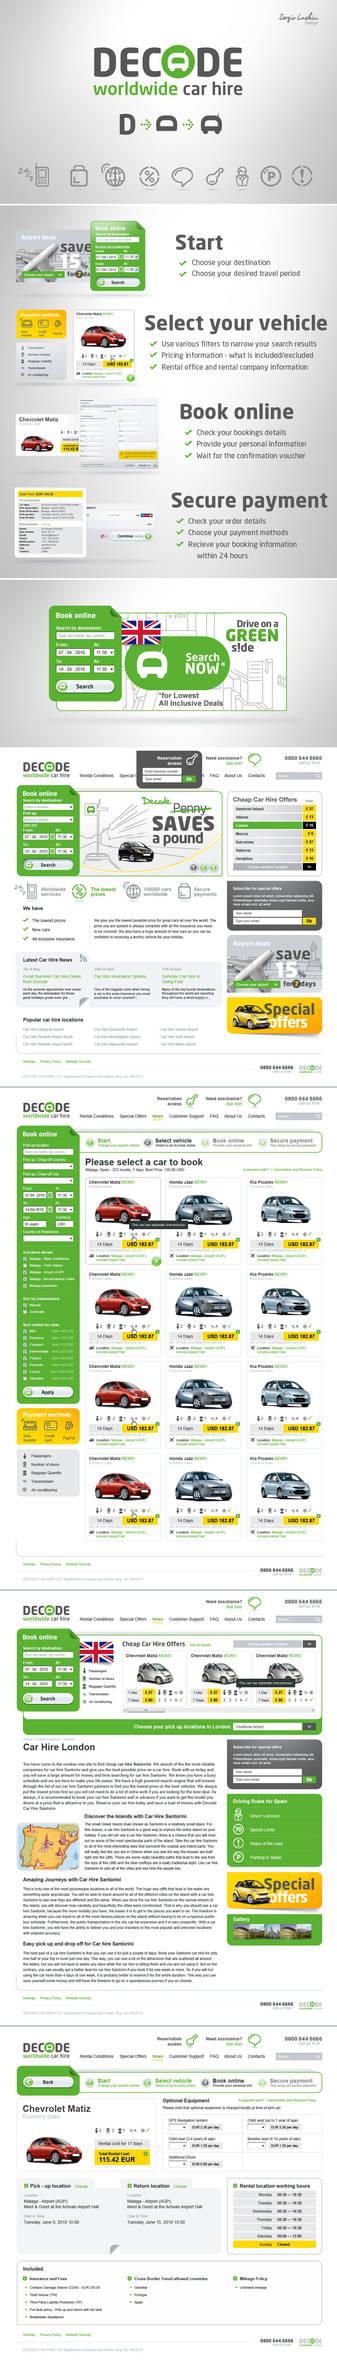 Decode web redesign